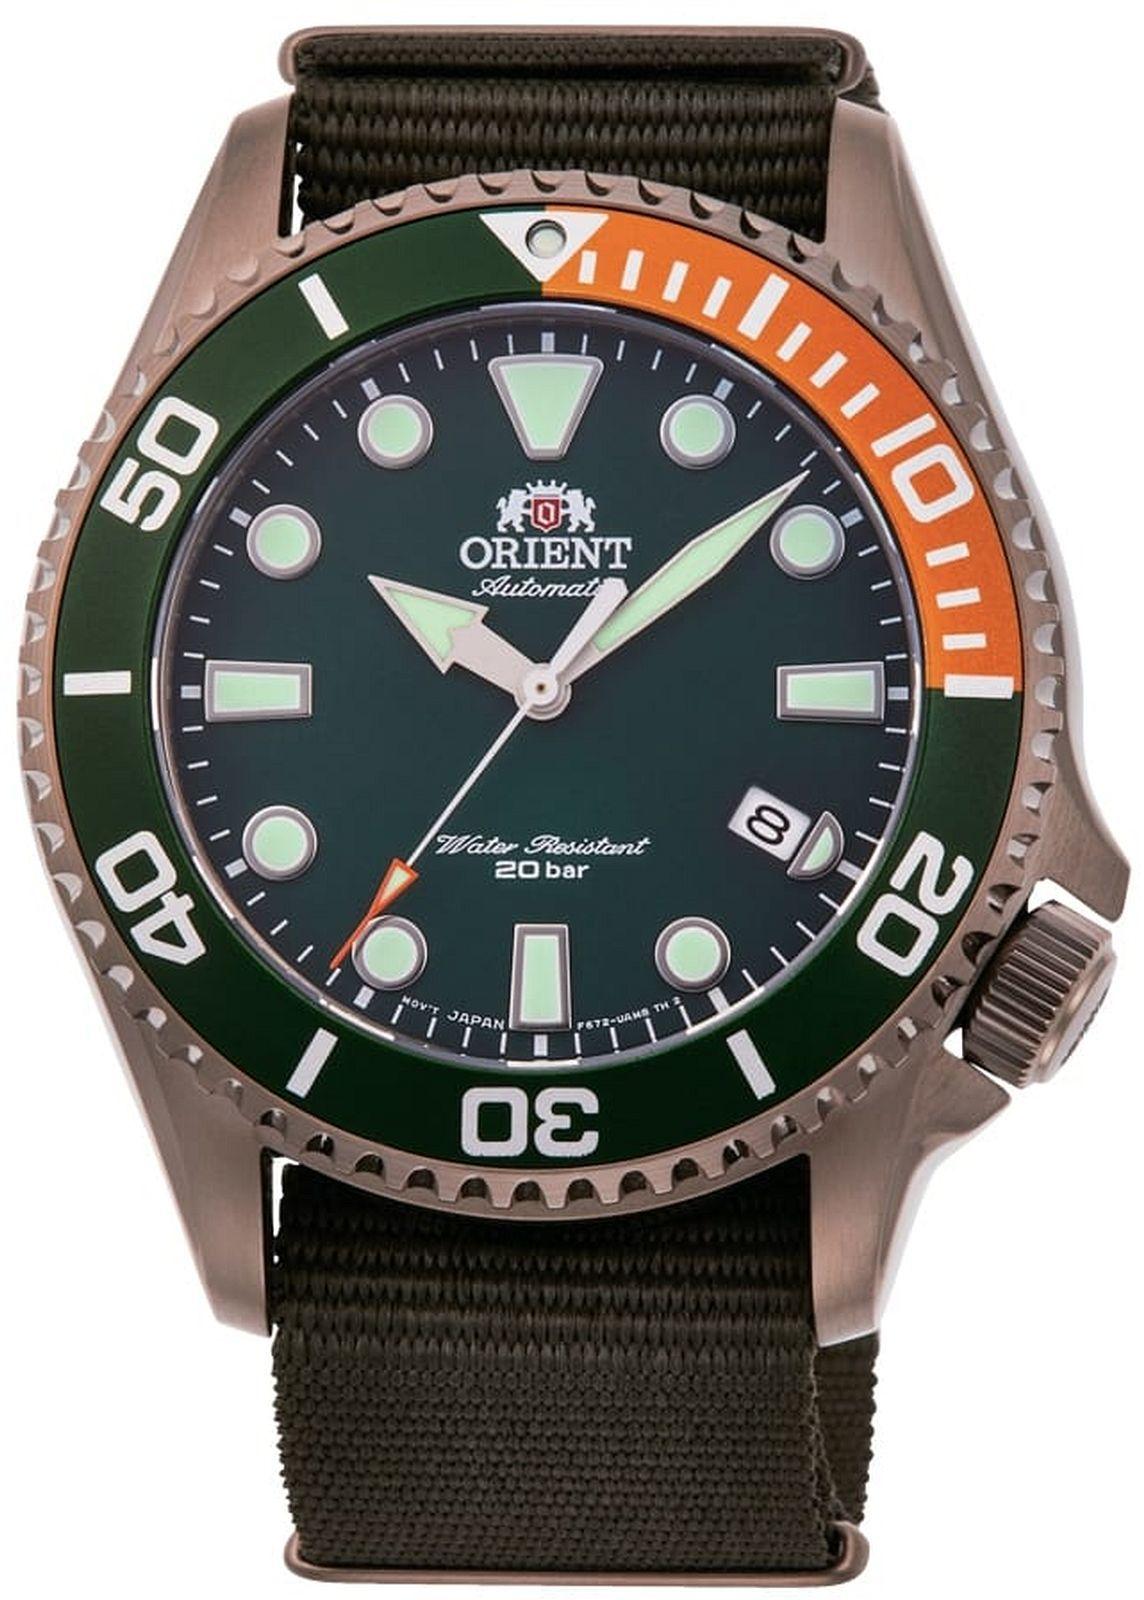 Zegarek męski Orient Sports Diver Automatic Limited Edition